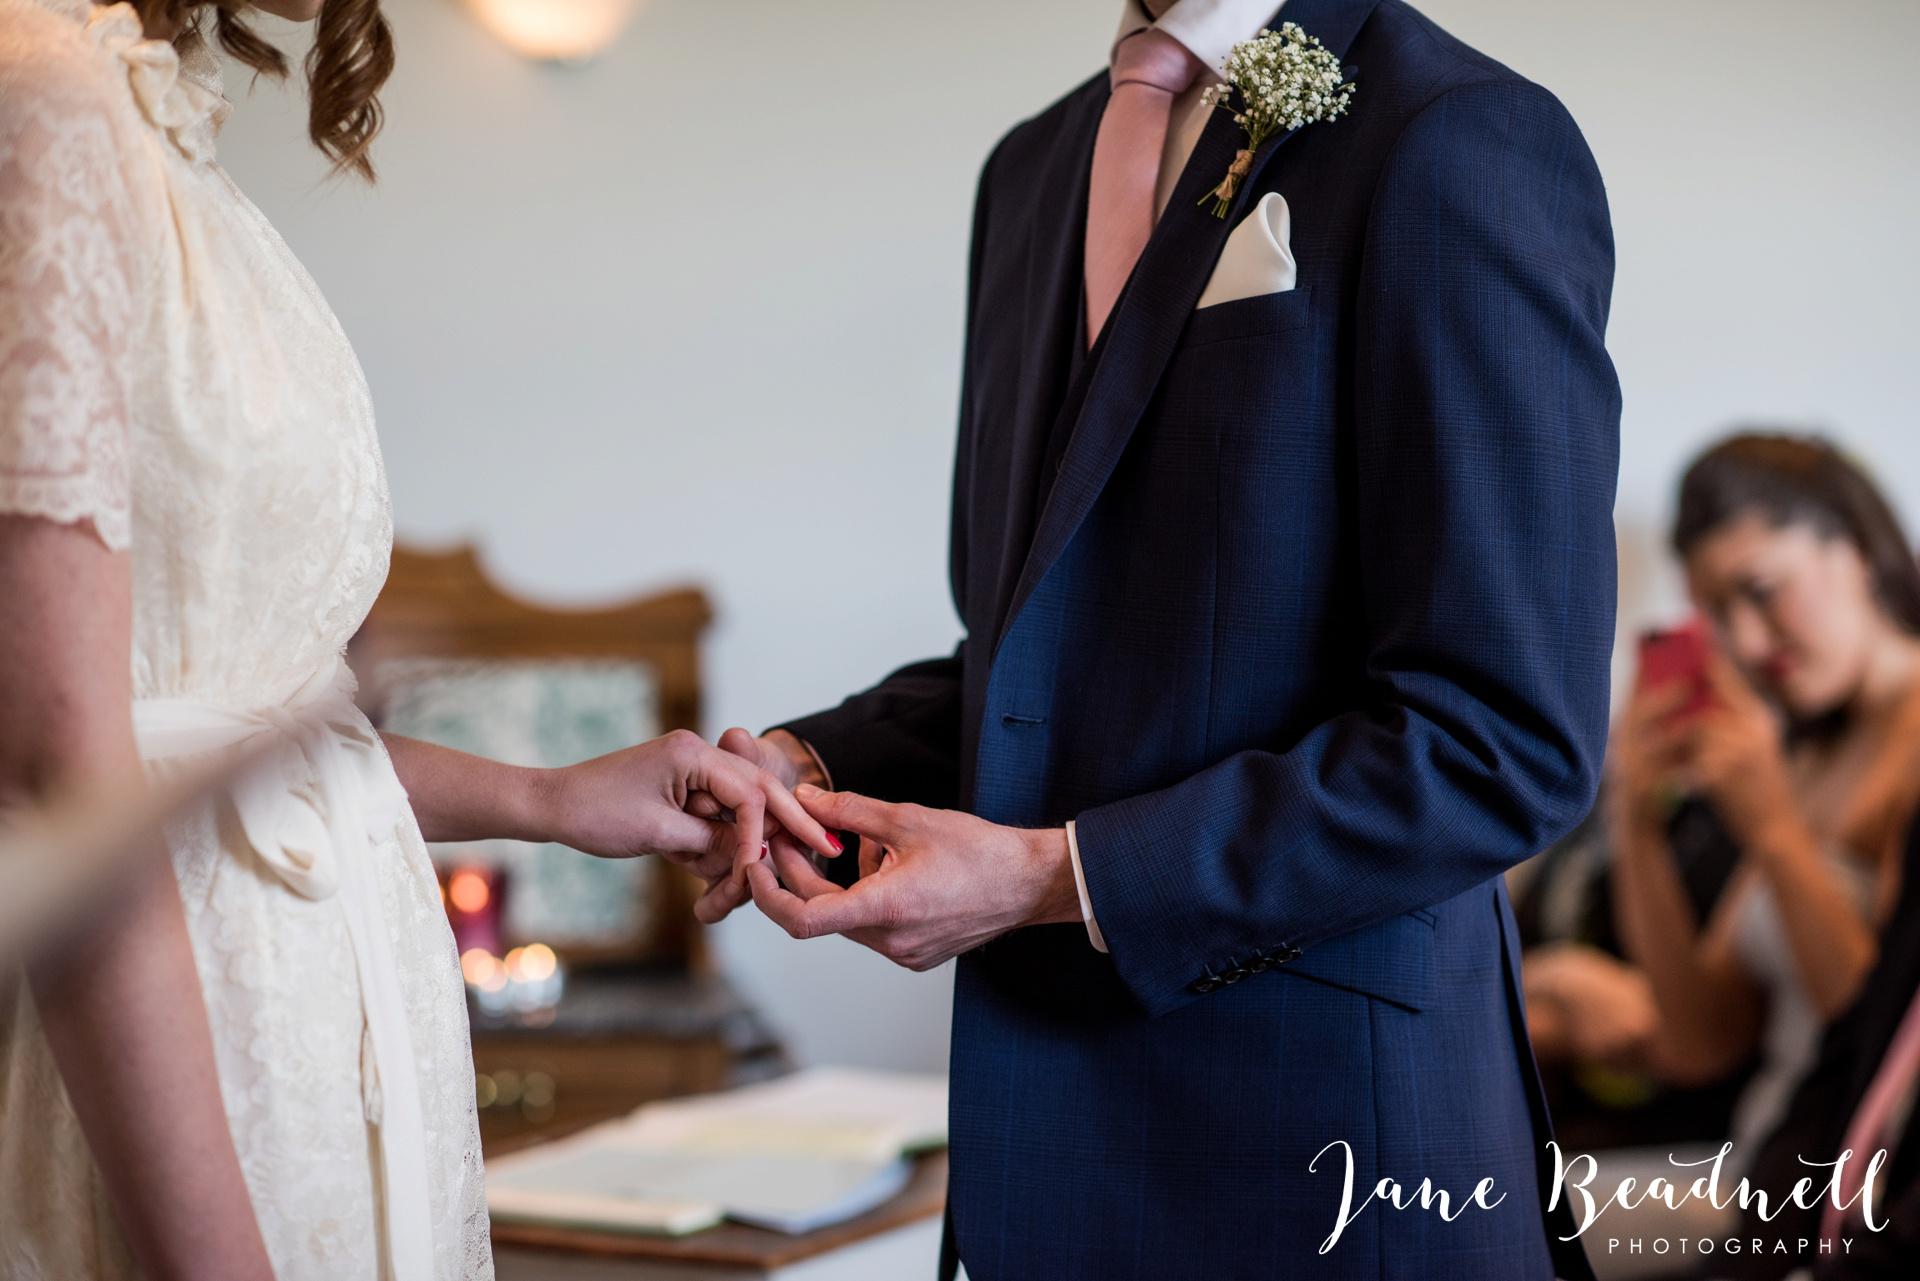 Jane Beadnell fine art wedding photographer The Cheerful Chilli Barn Otley_0017